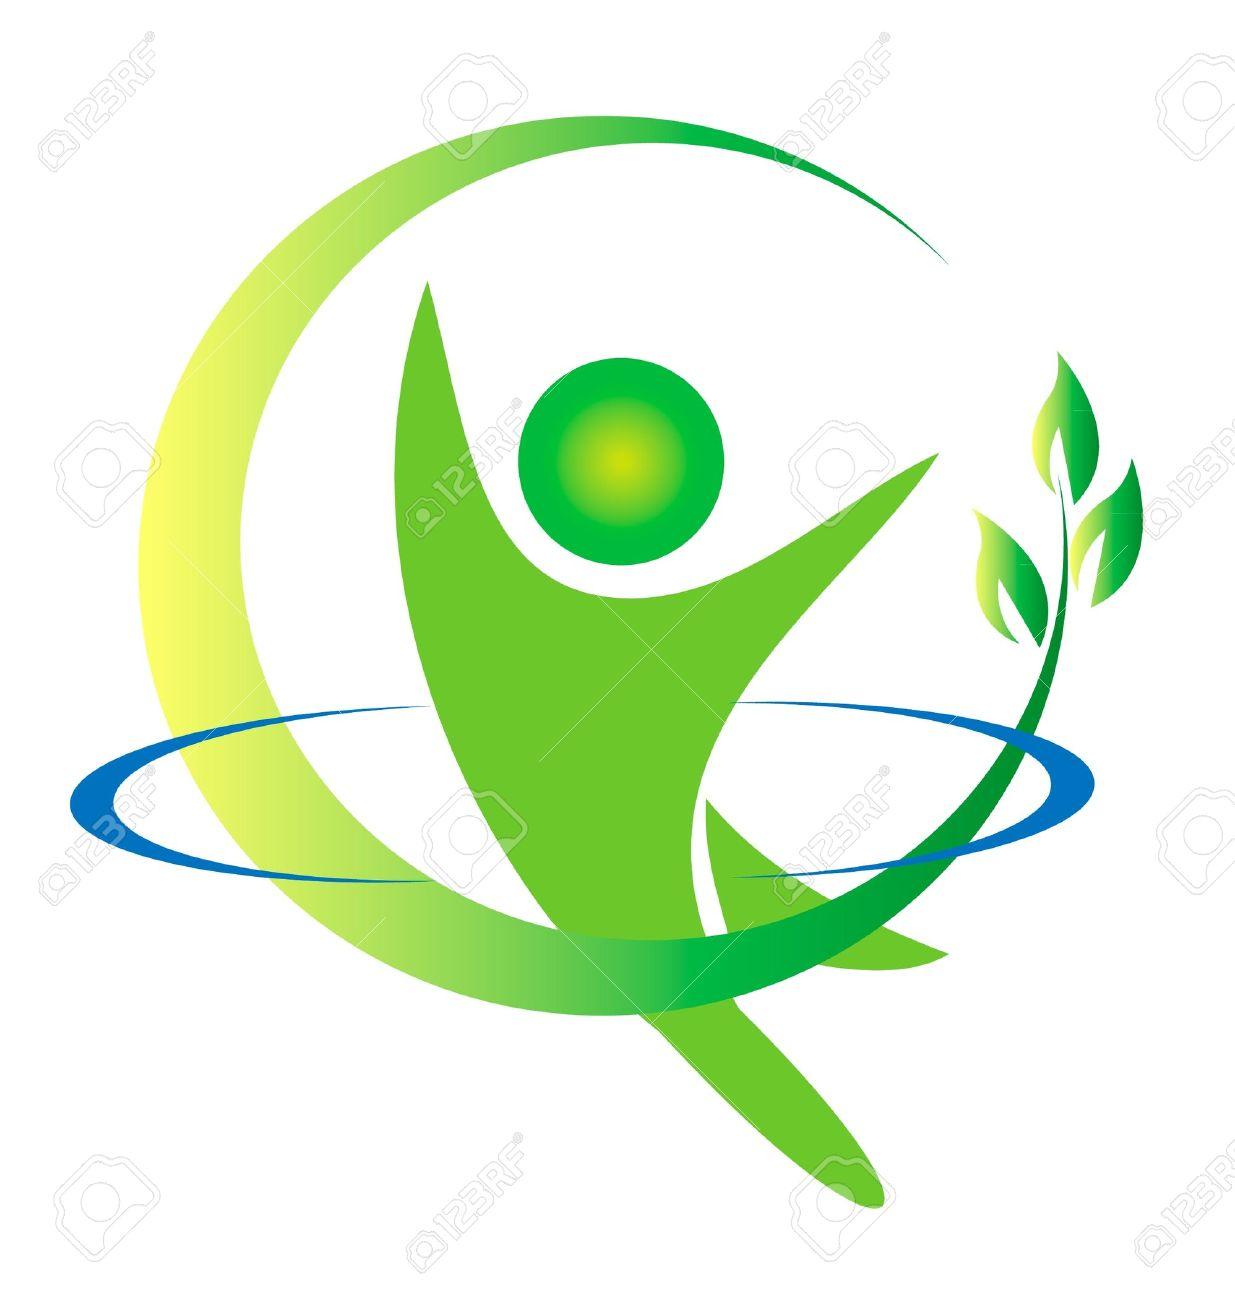 image logo sante